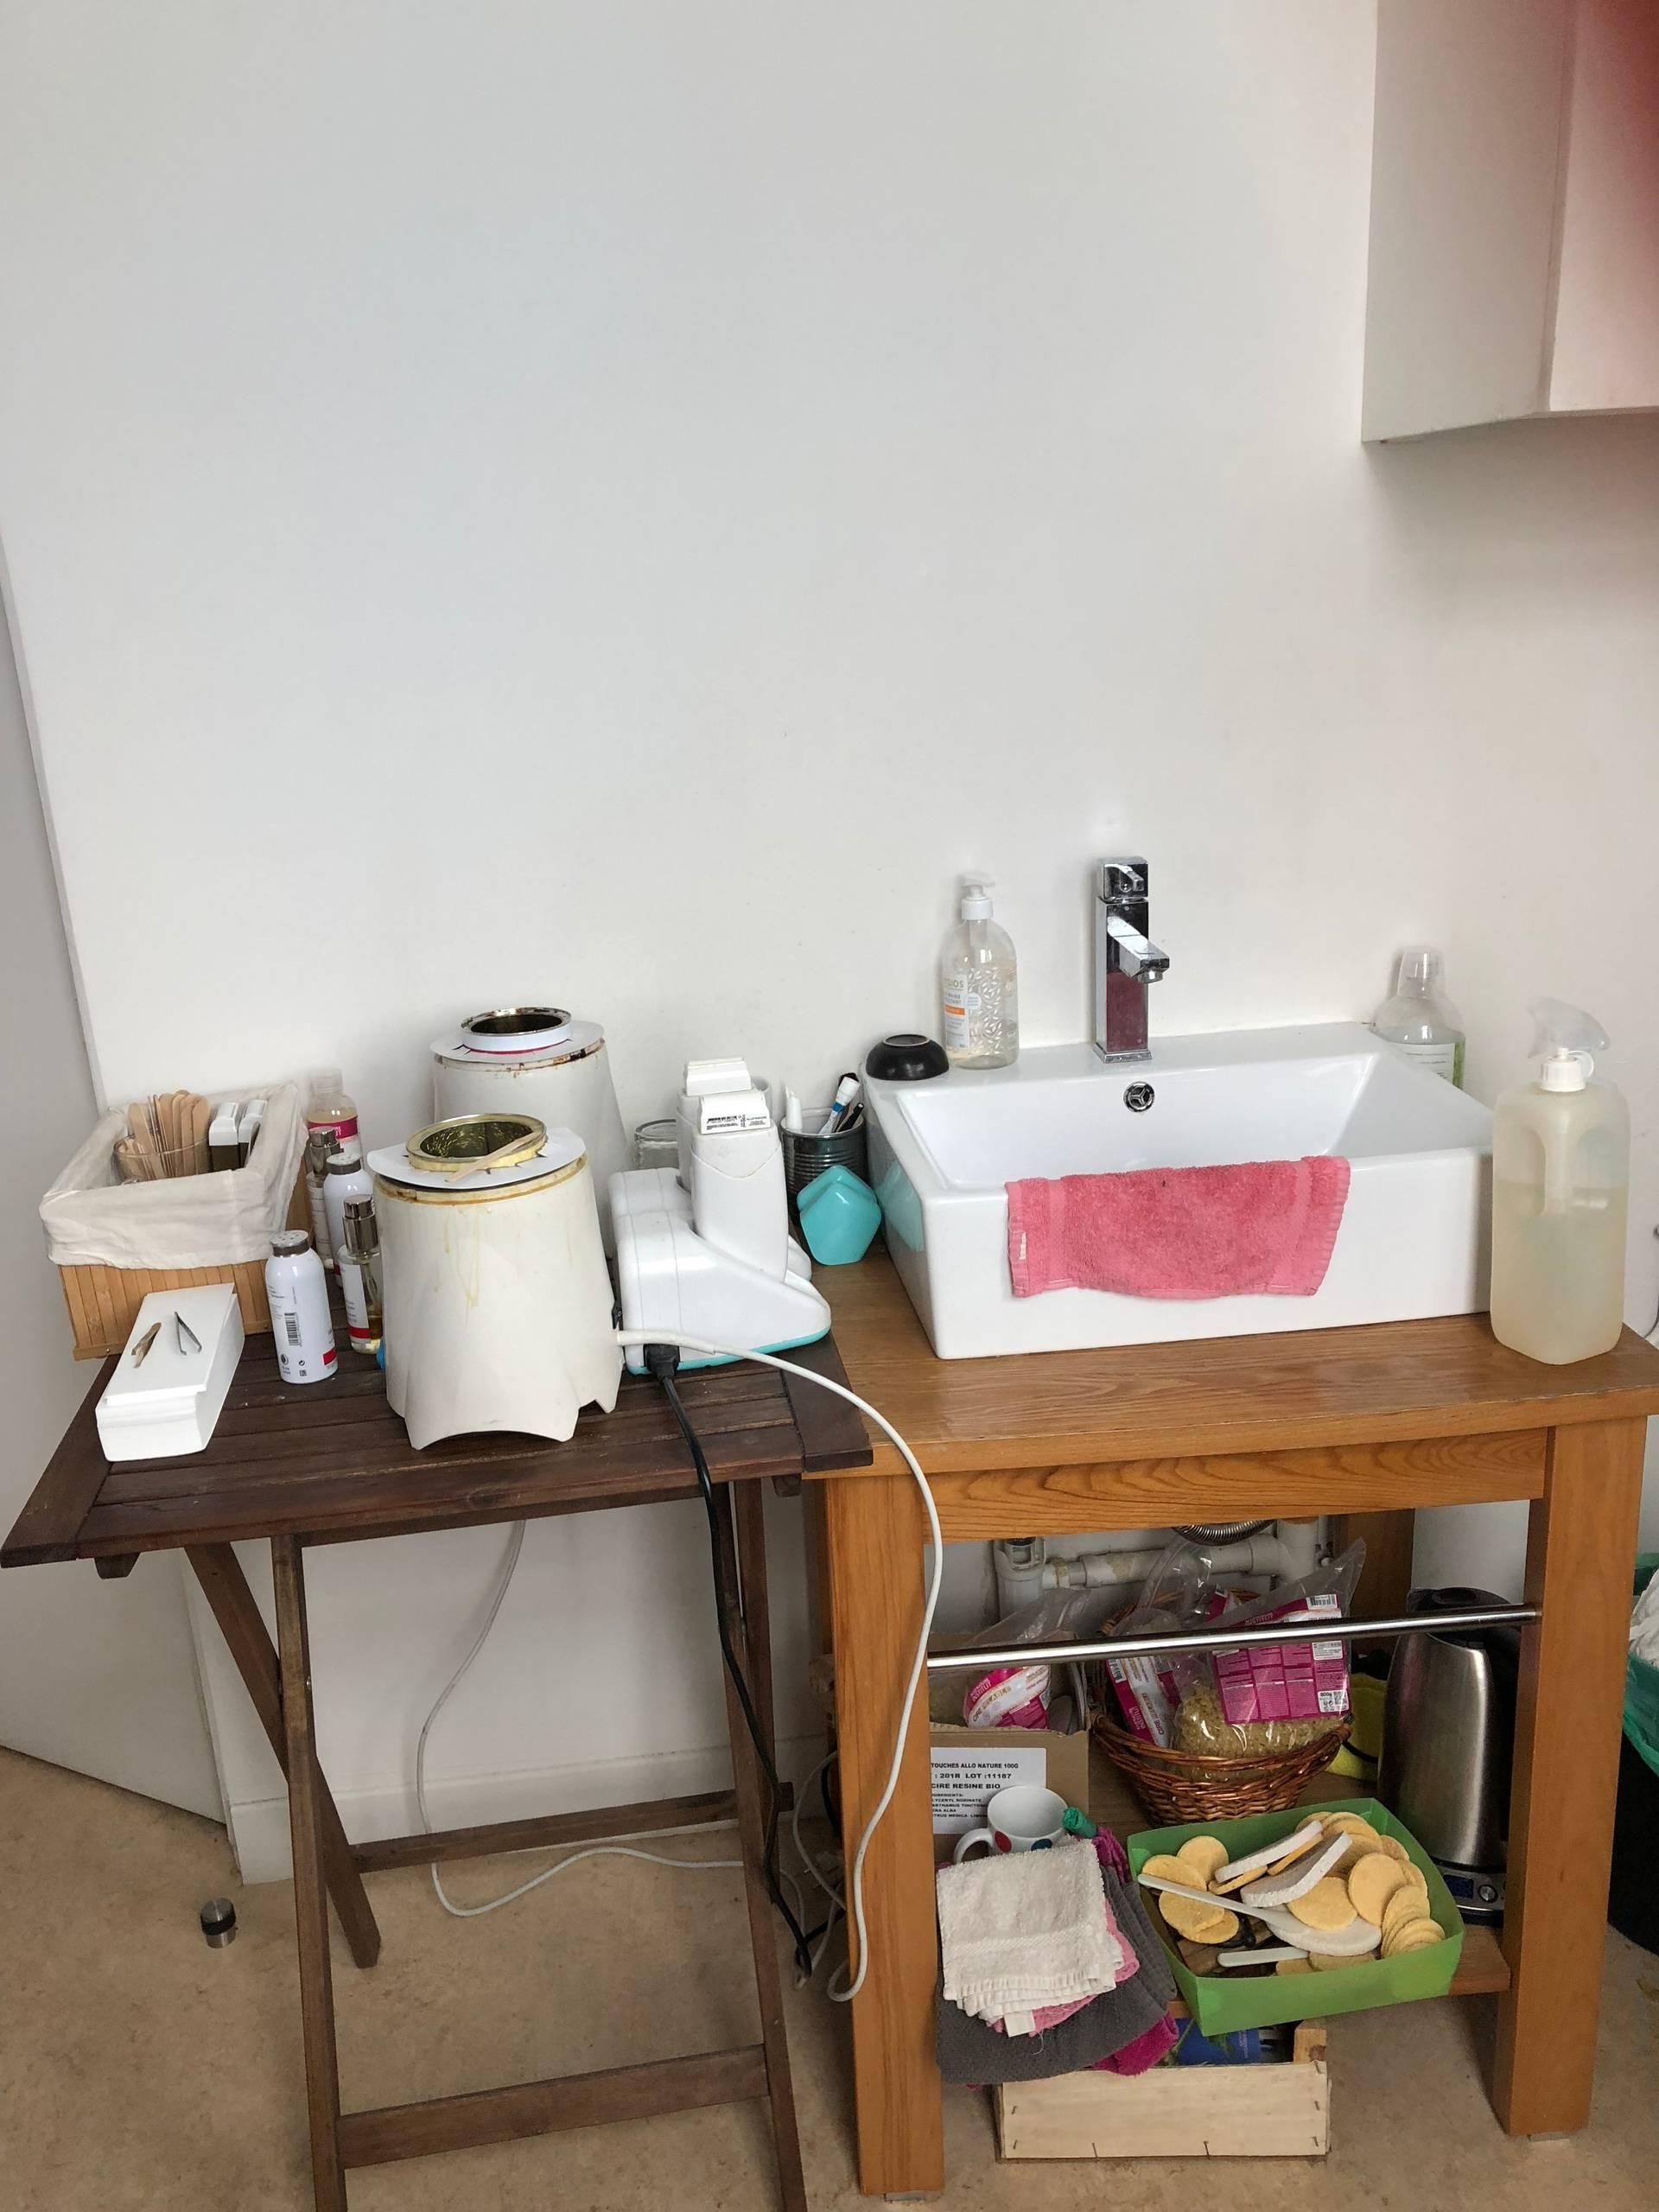 L'espace hygiène avant